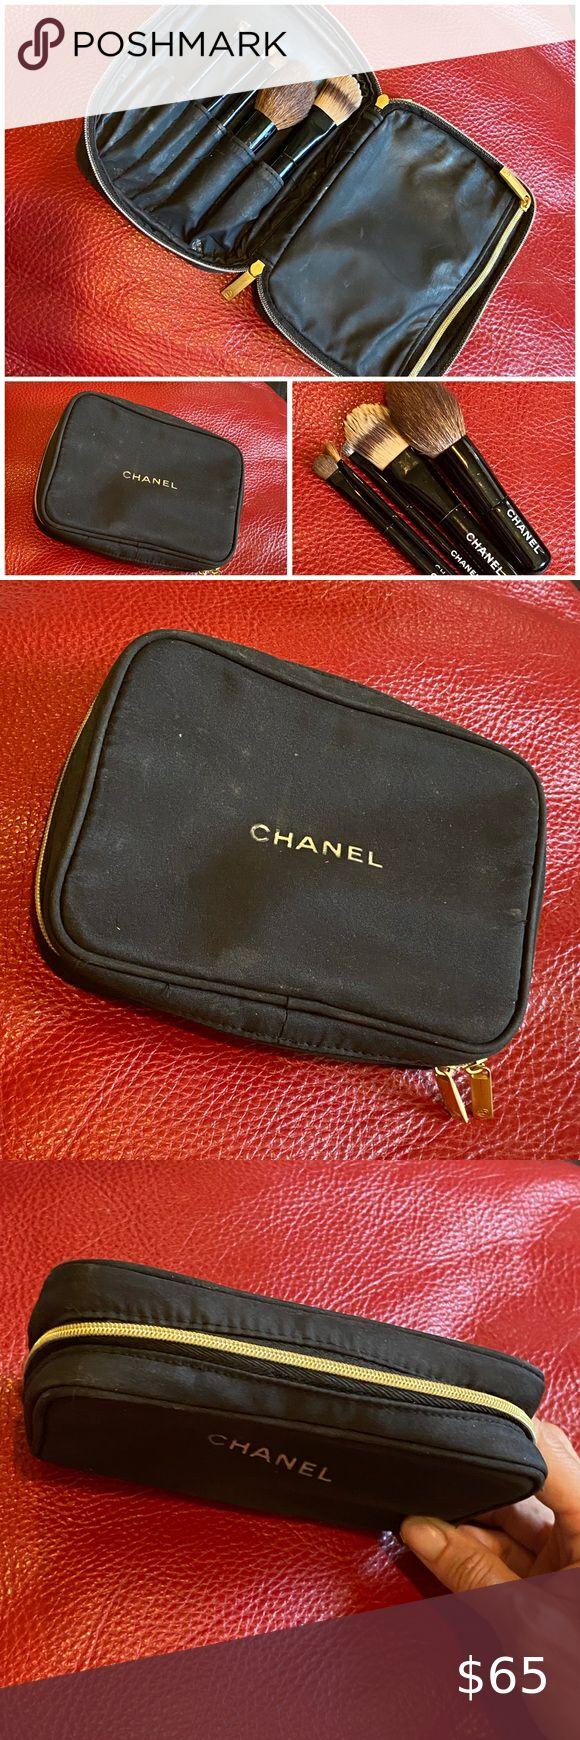 Chanel make up brush set & bag in 2020 Makeup brush set